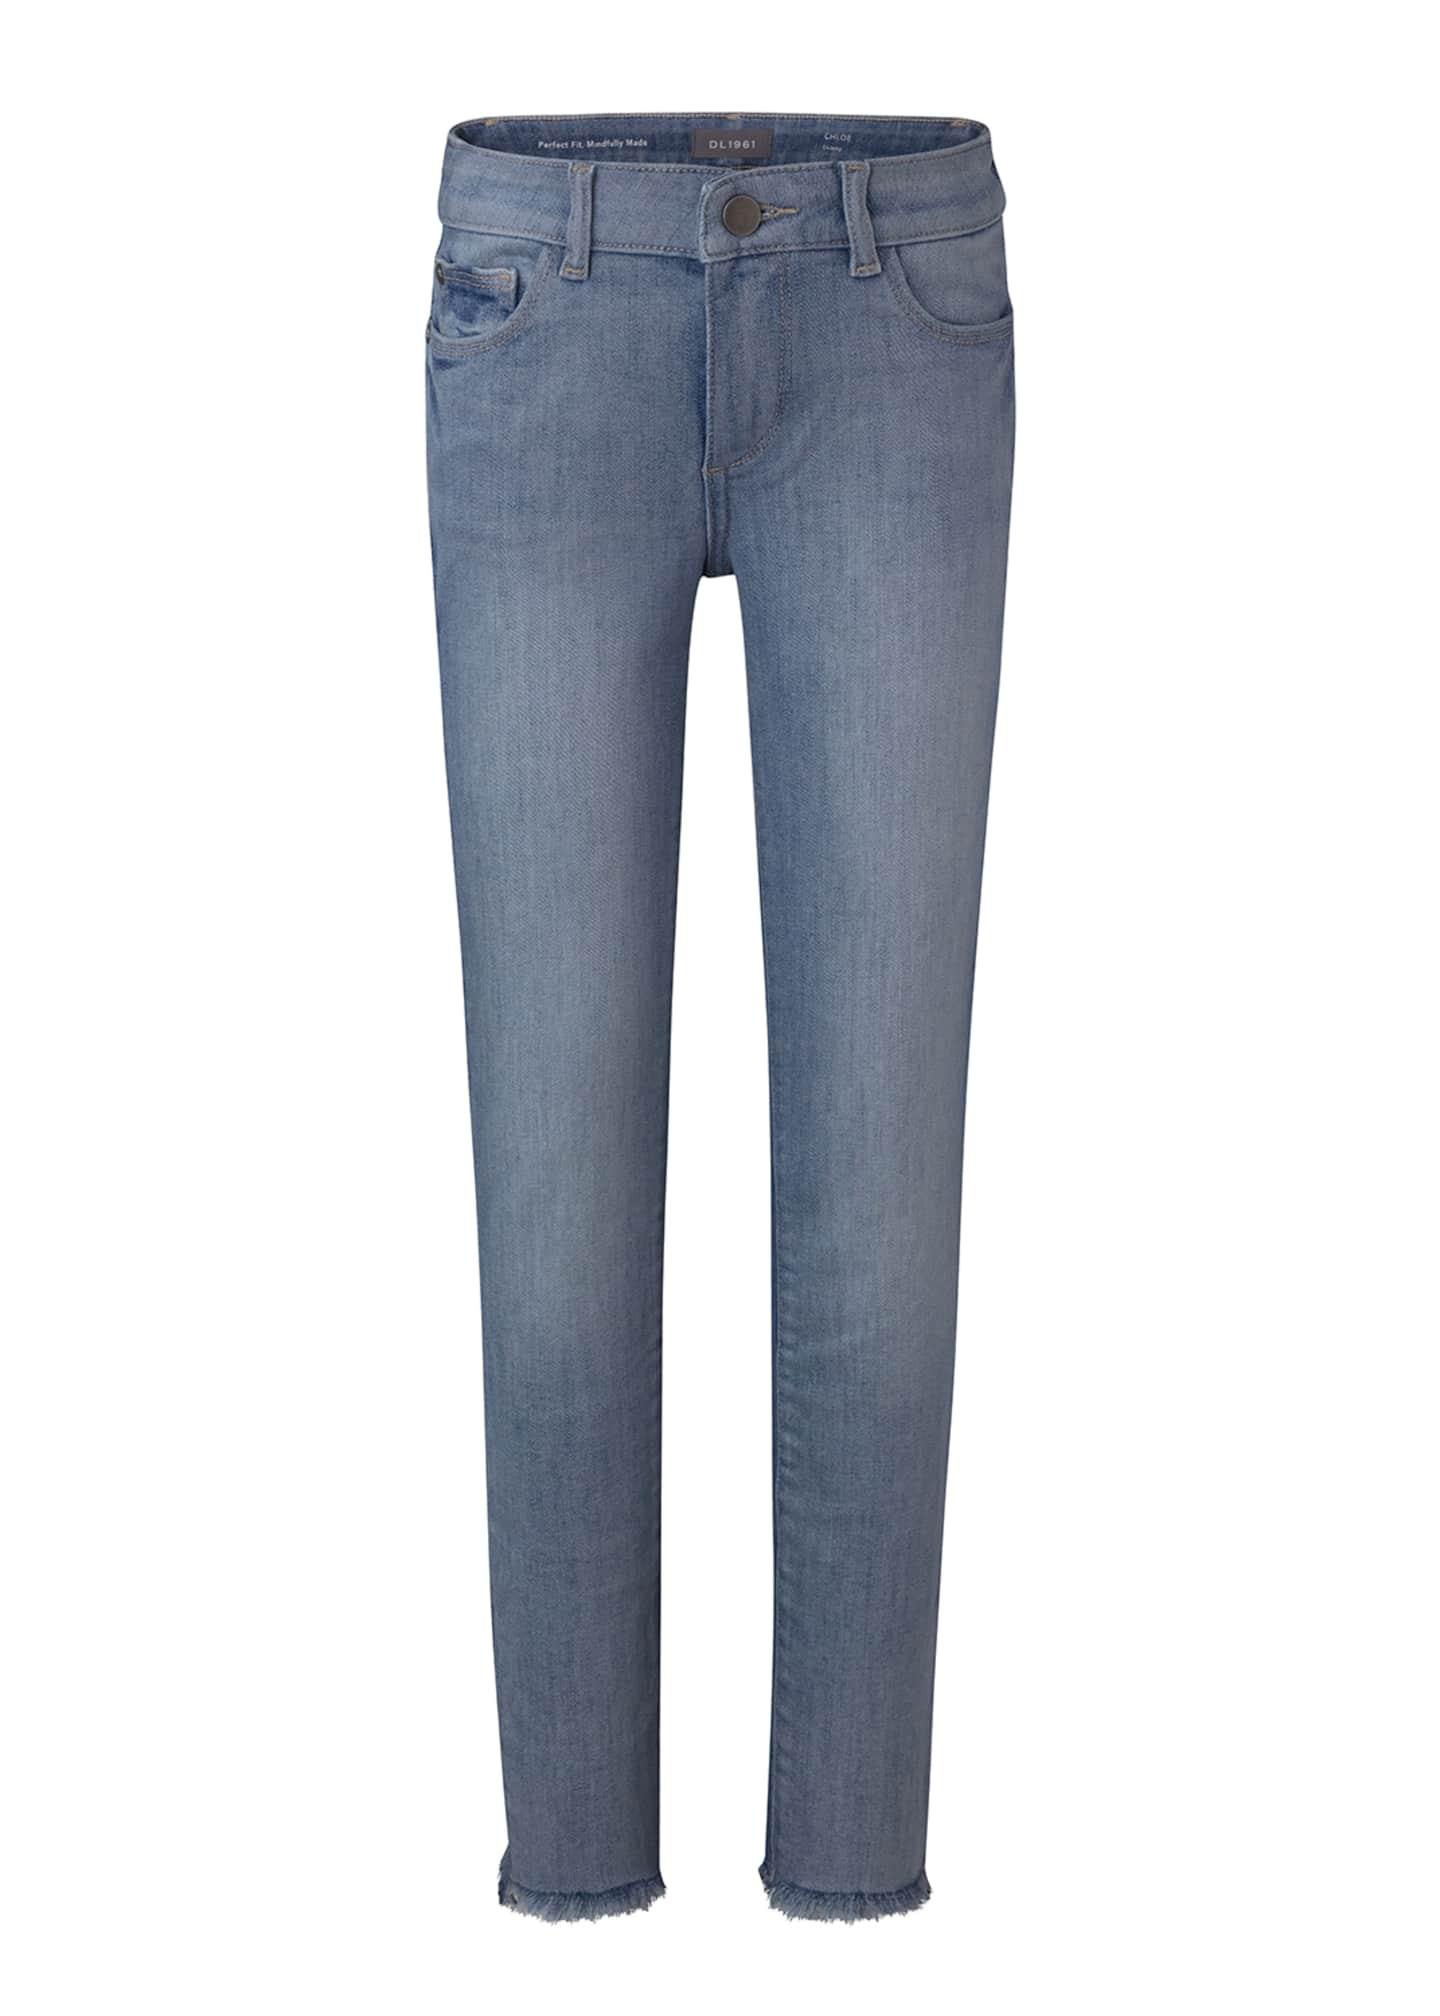 DL 1961 Girl's Chloe Niagara Skinny Denim Jeans,